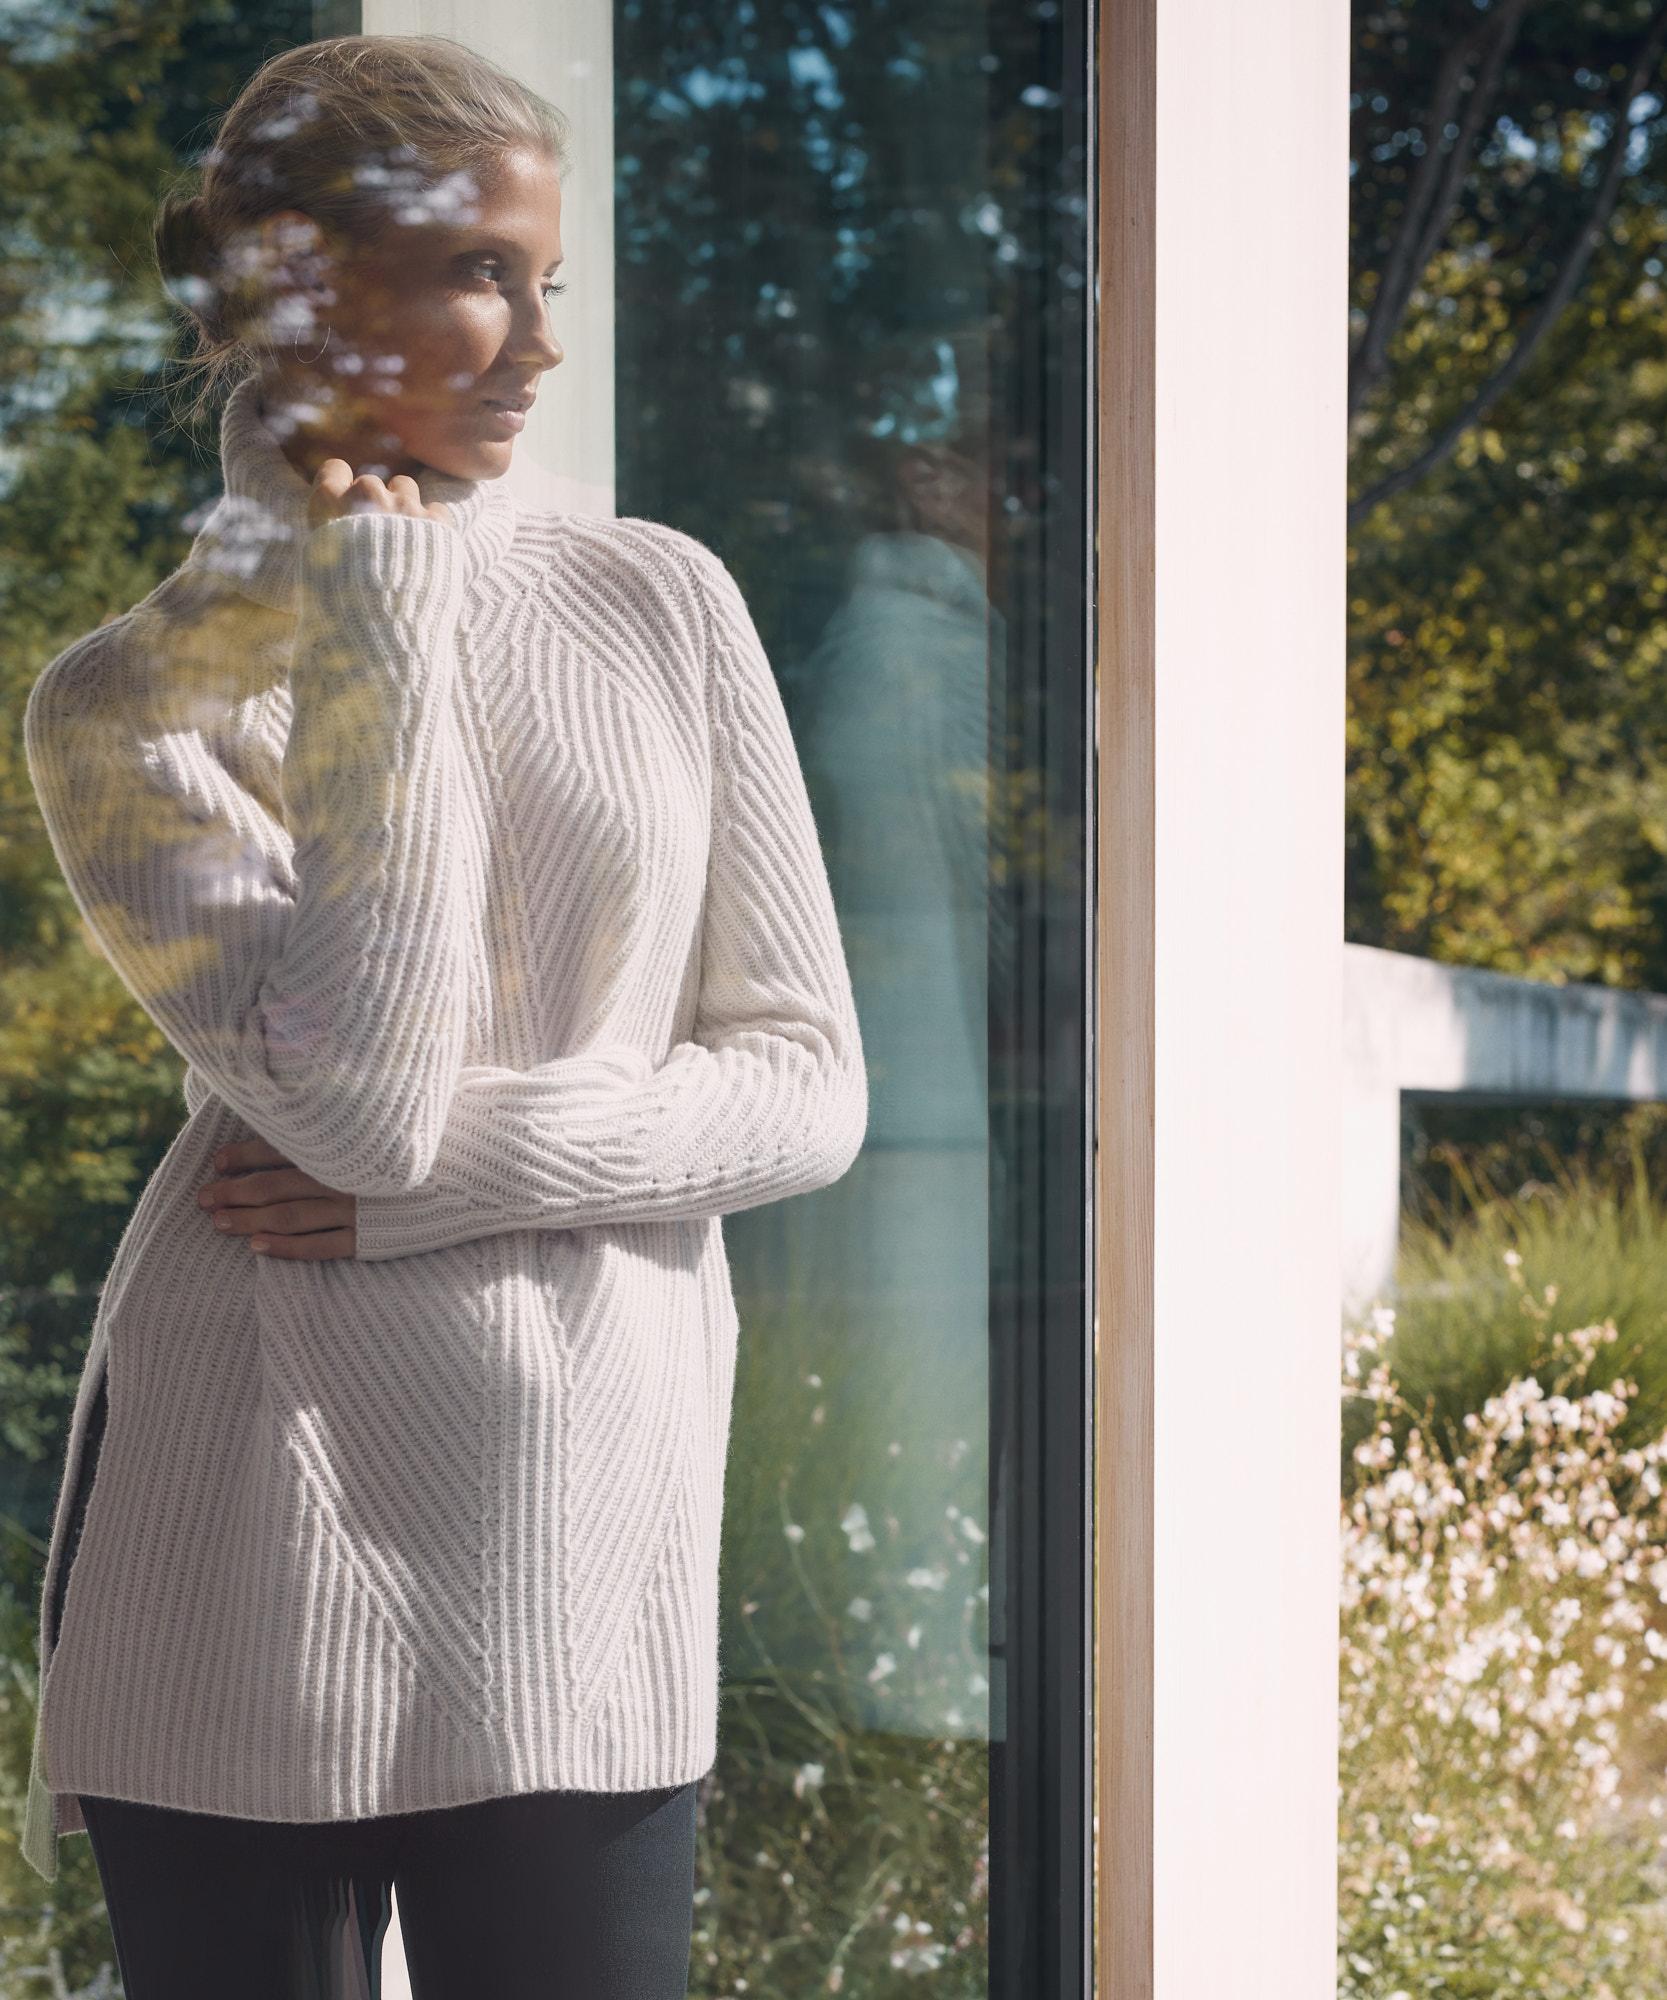 bernd-westphal-stillstars-vanlaack-women-auttum-winter-2020-fashion-photography-009